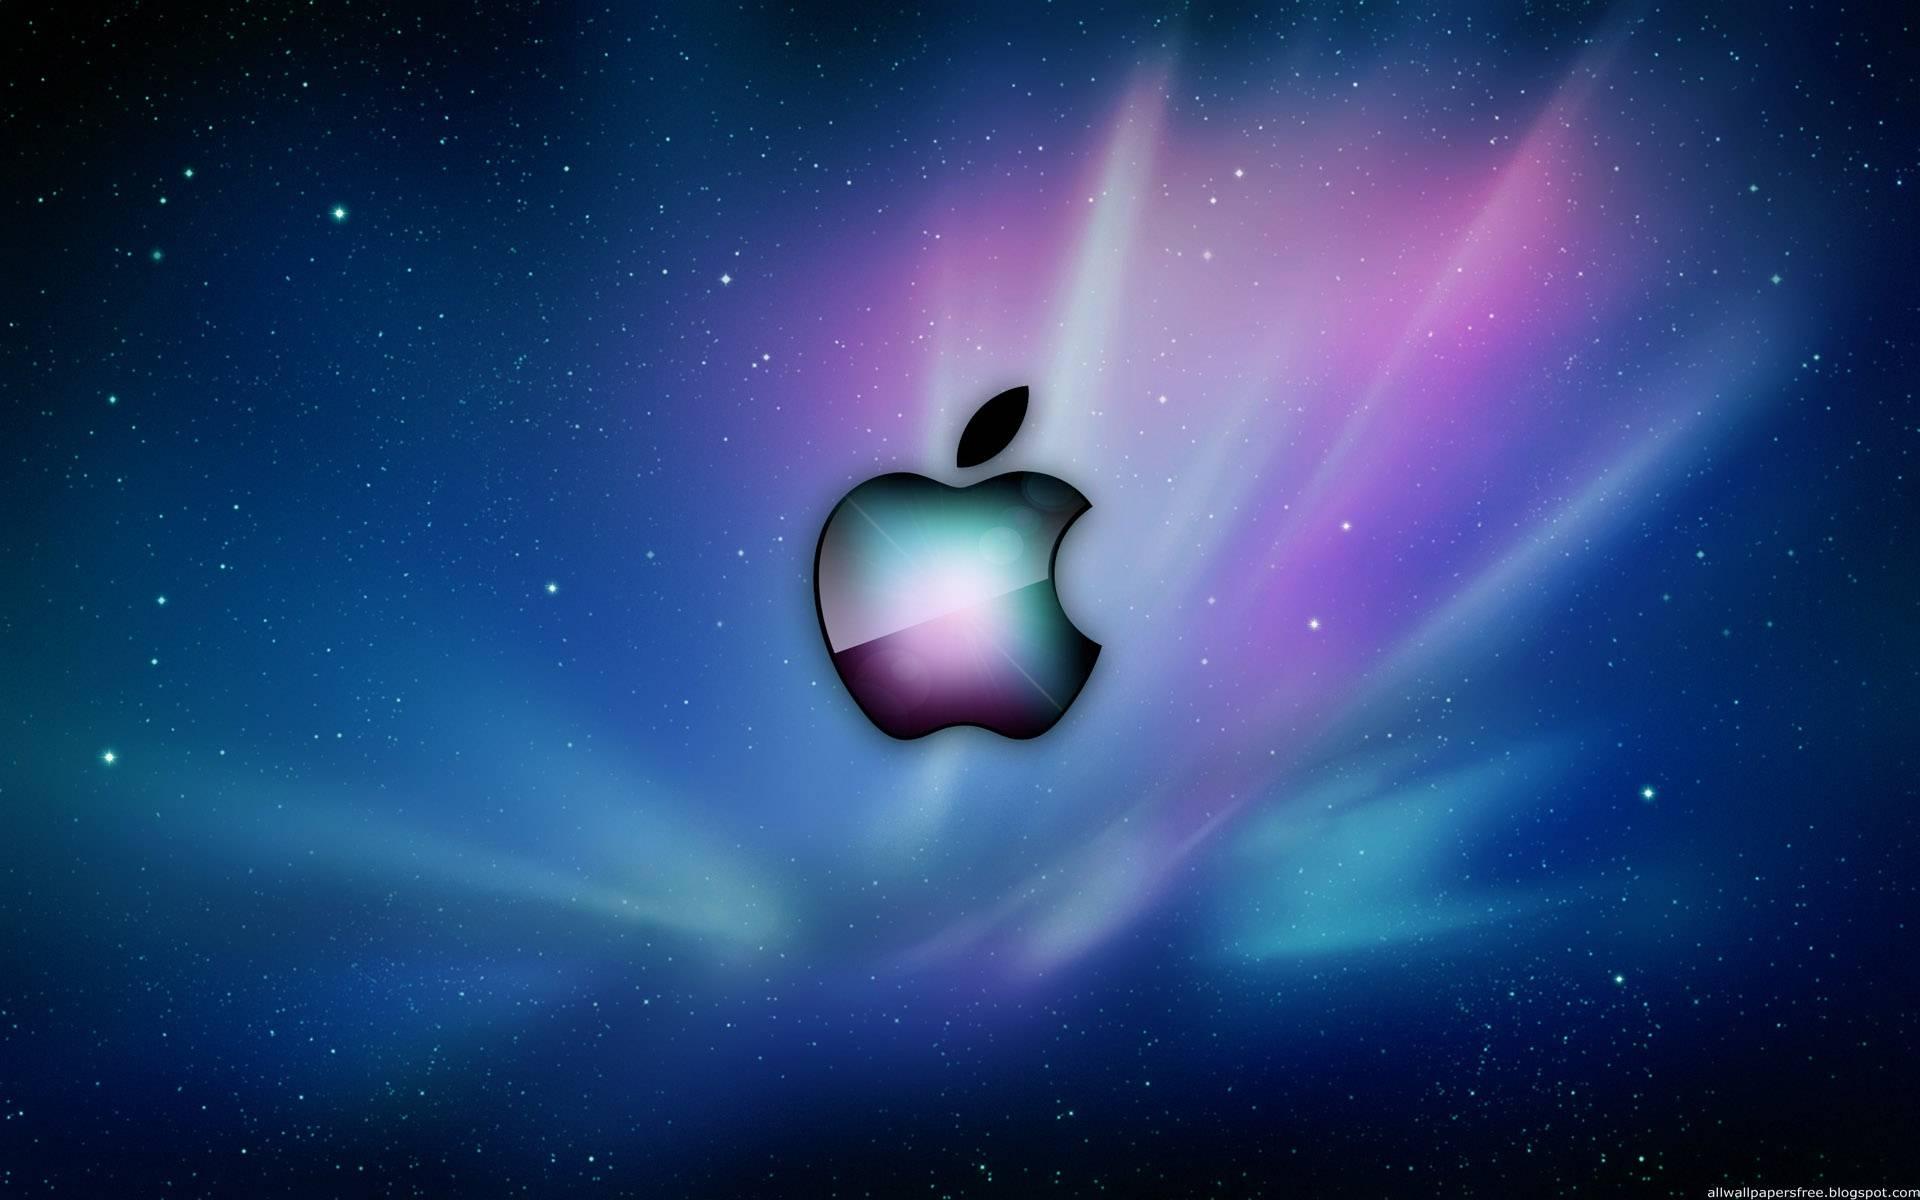 Free Download Amazing Apple Hd Apple Wallpaper 1920x1200 For Your Desktop Mobile Tablet Explore 48 Apple Wallpaper For Mac Apple Desktop Wallpapers Mac Wallpaper Backgrounds Hd Wallpaper Mac